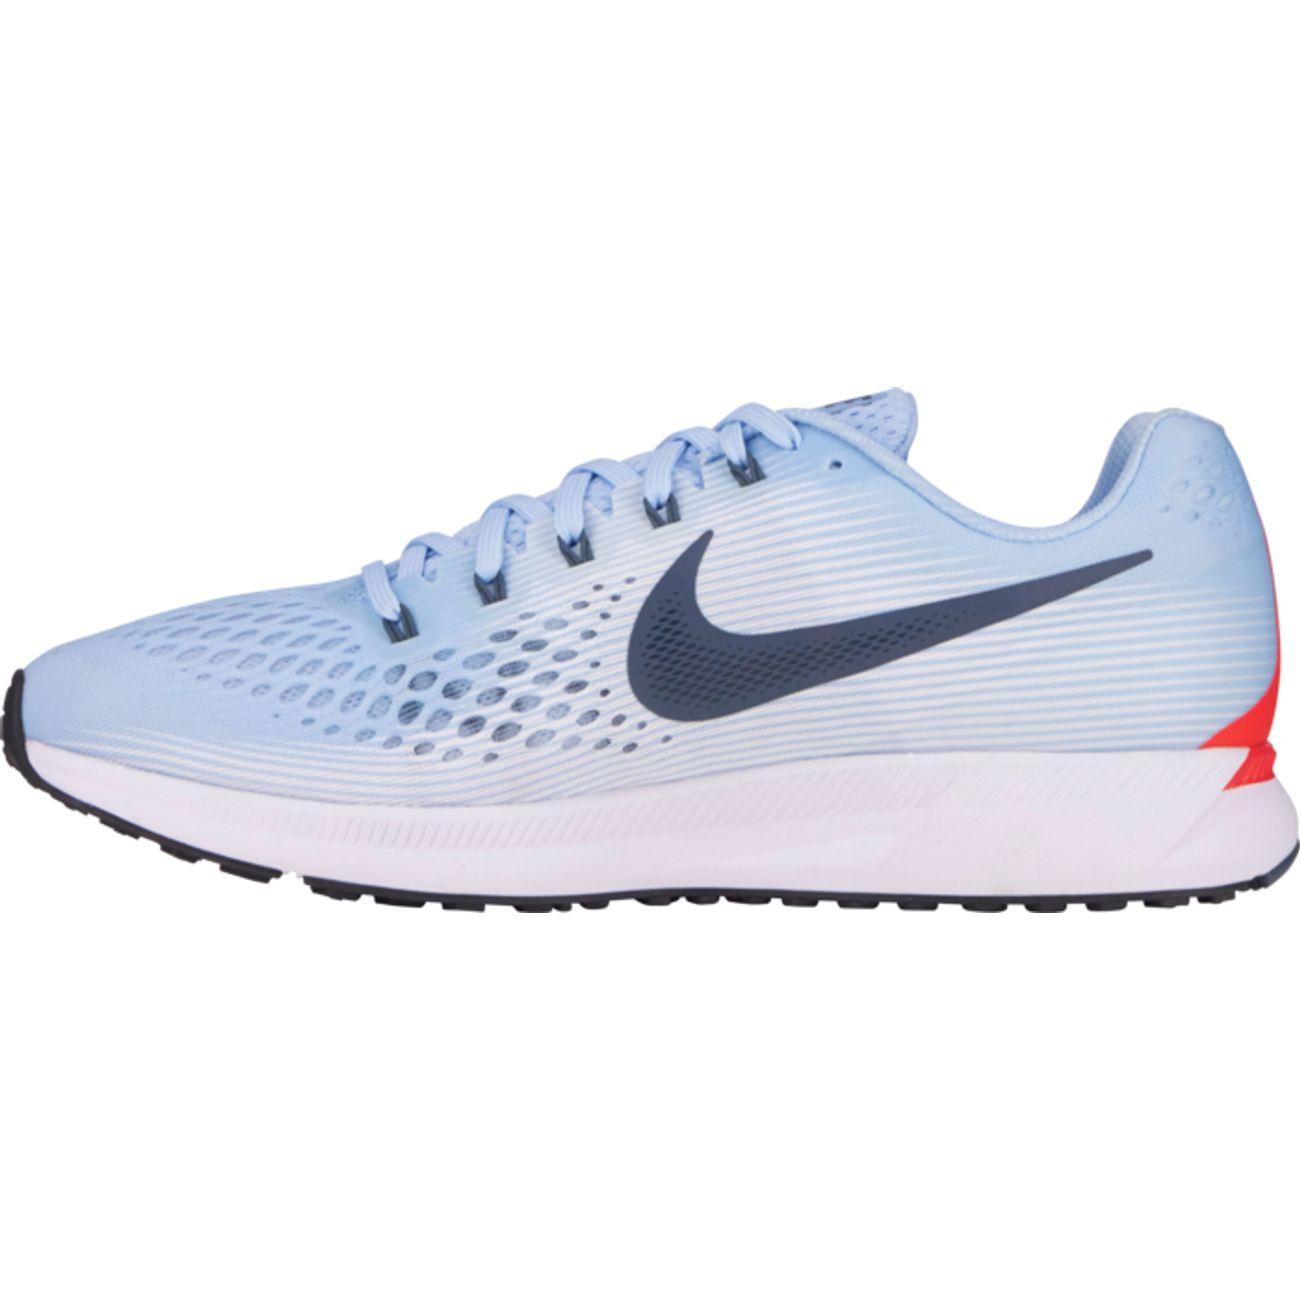 737badbc1336d ... M Chaussures Running homme NIKE NIKE AIR ZOOM PEGASUS 34 ...